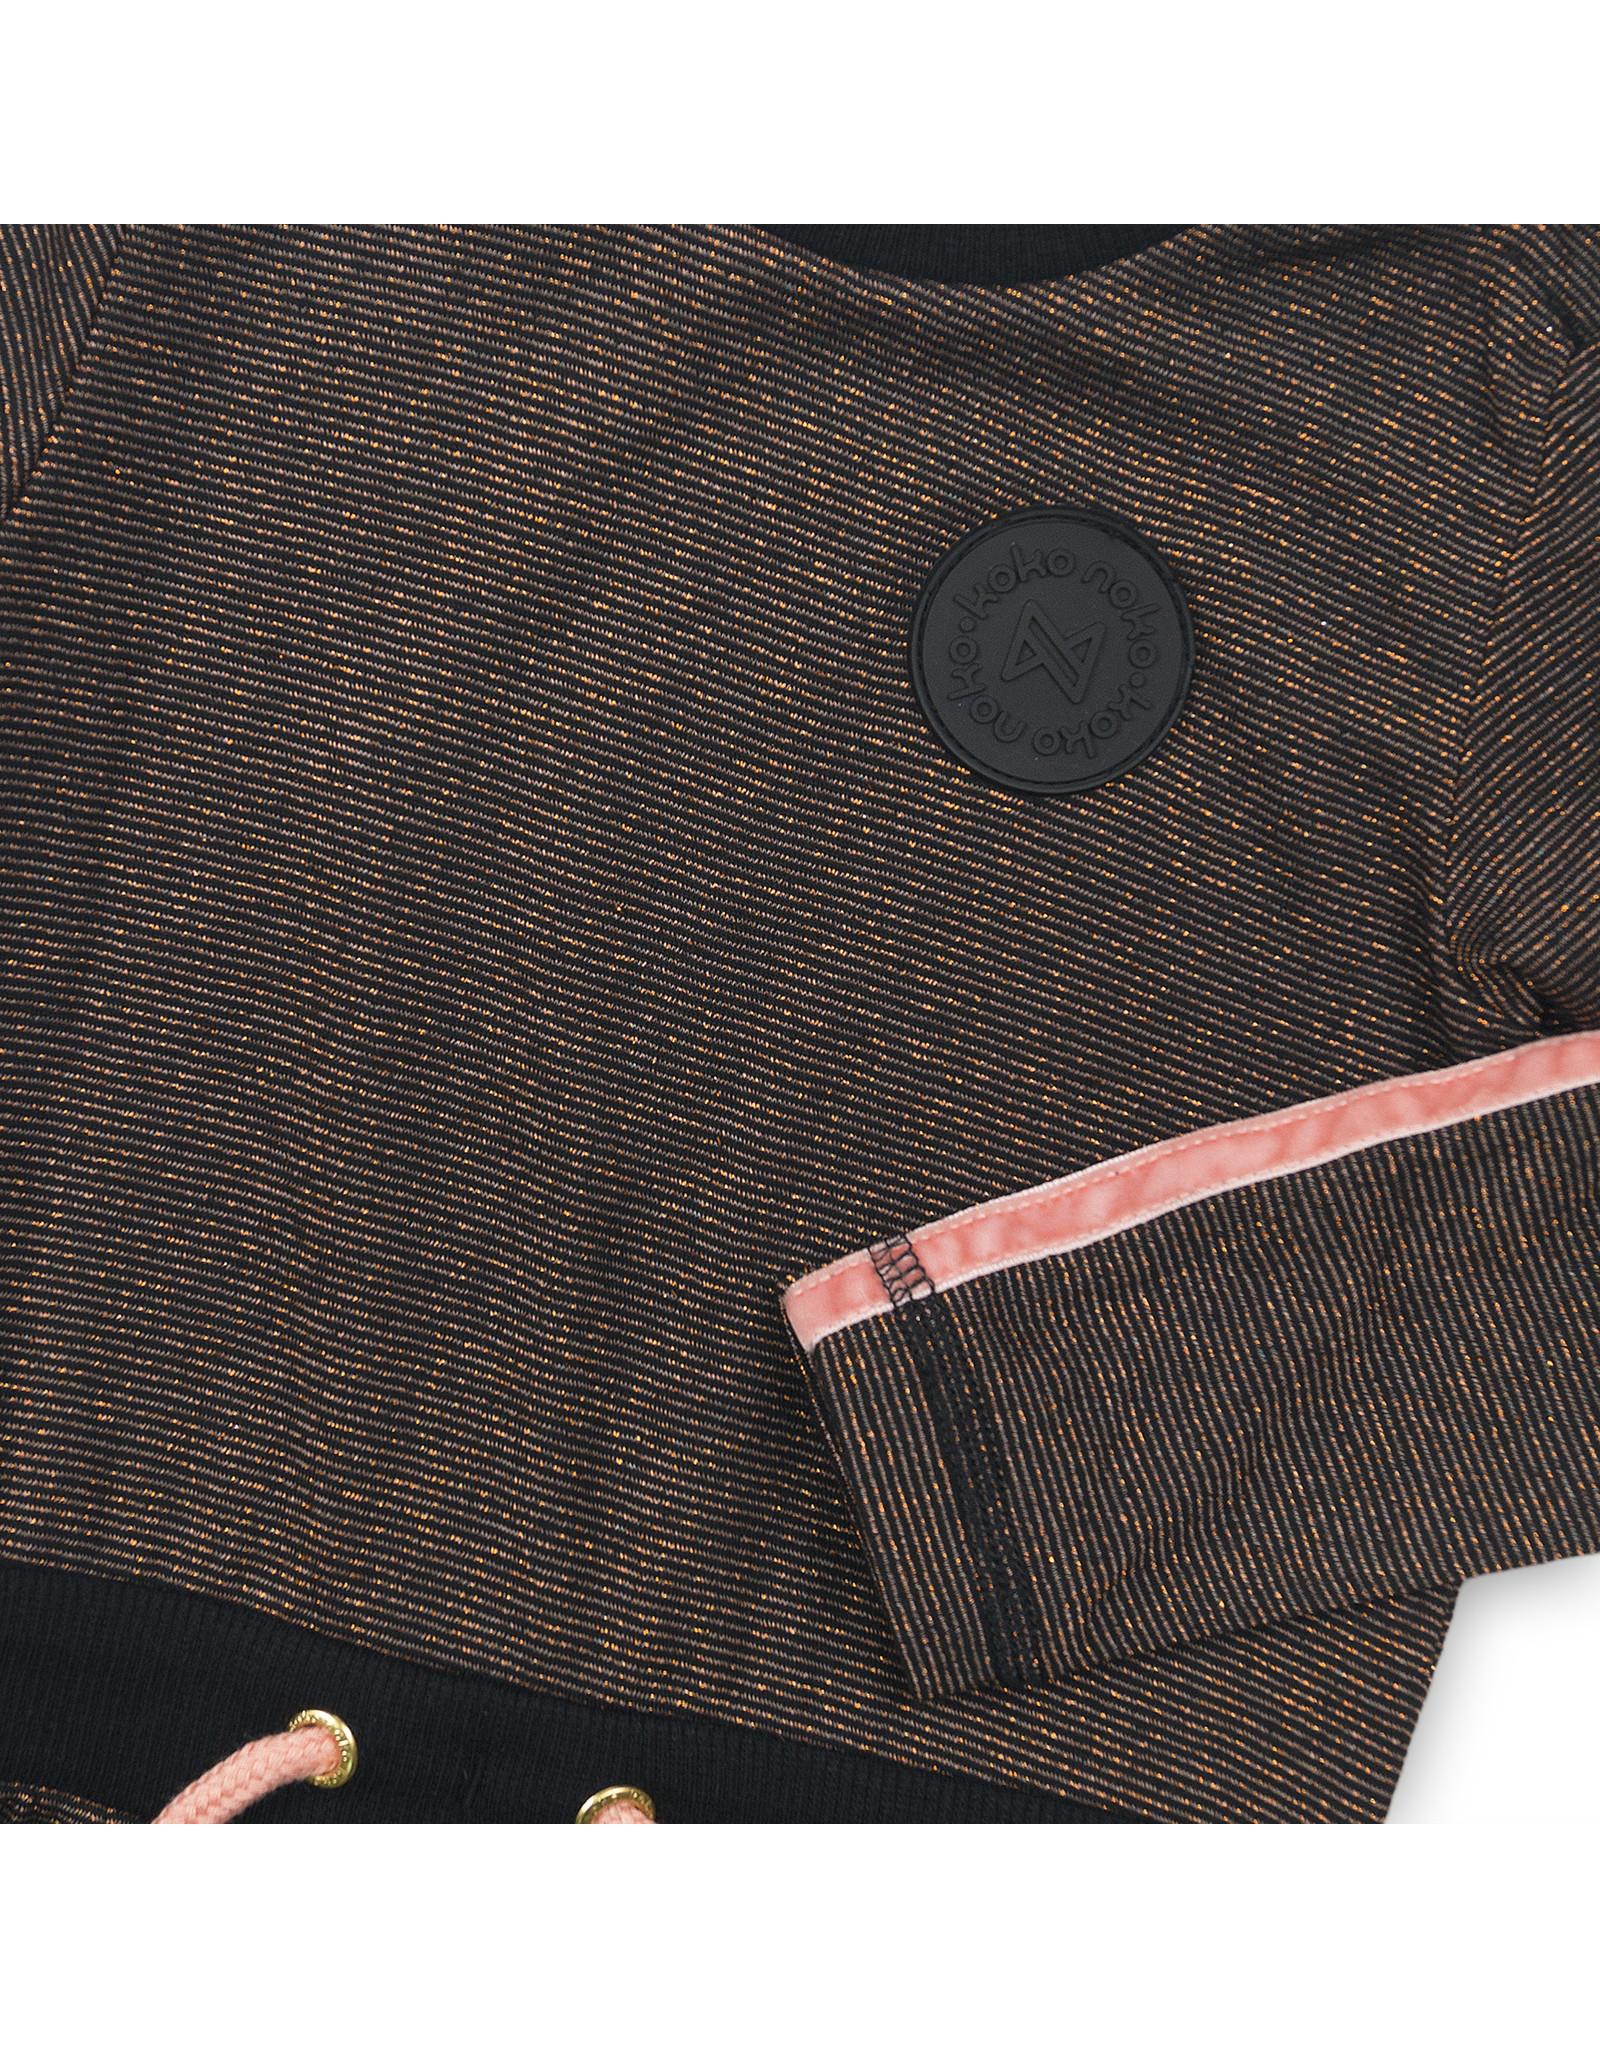 Koko Noko Koko Noko meisjes jurk Rosé Glitter Black